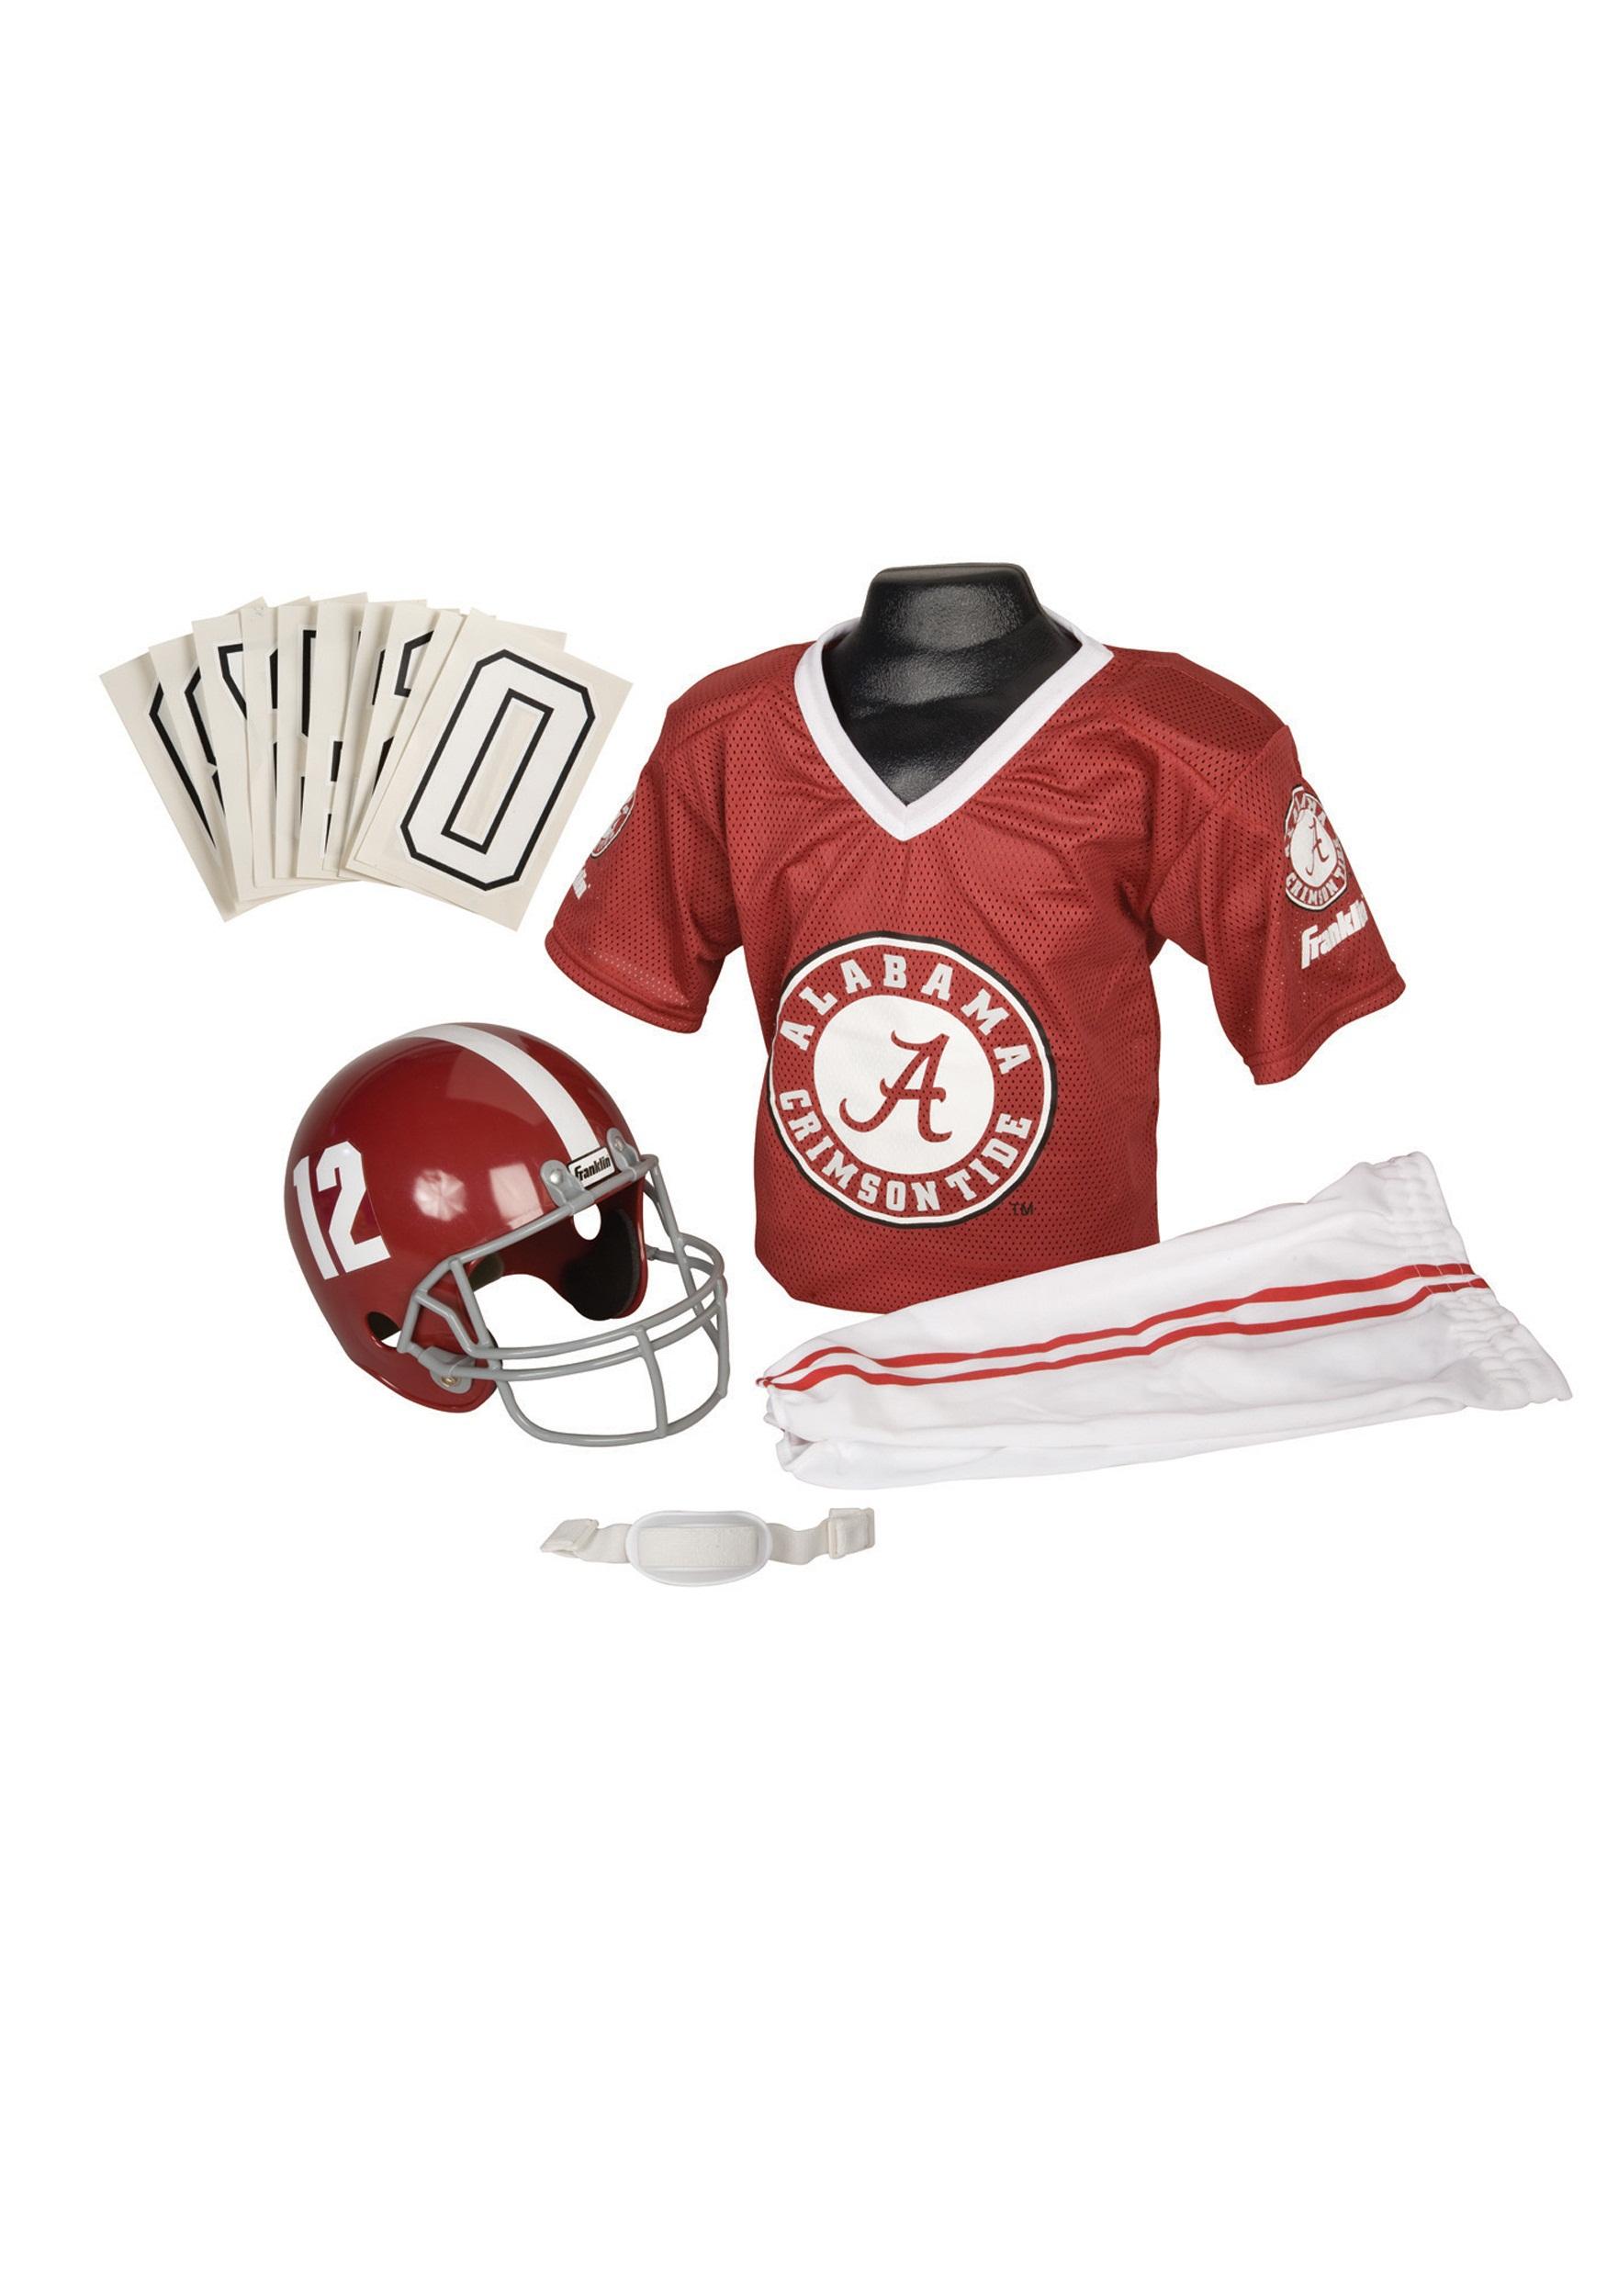 lowest price ee0ee 6c950 Alabama Crimson Tide Child Uniform Costume